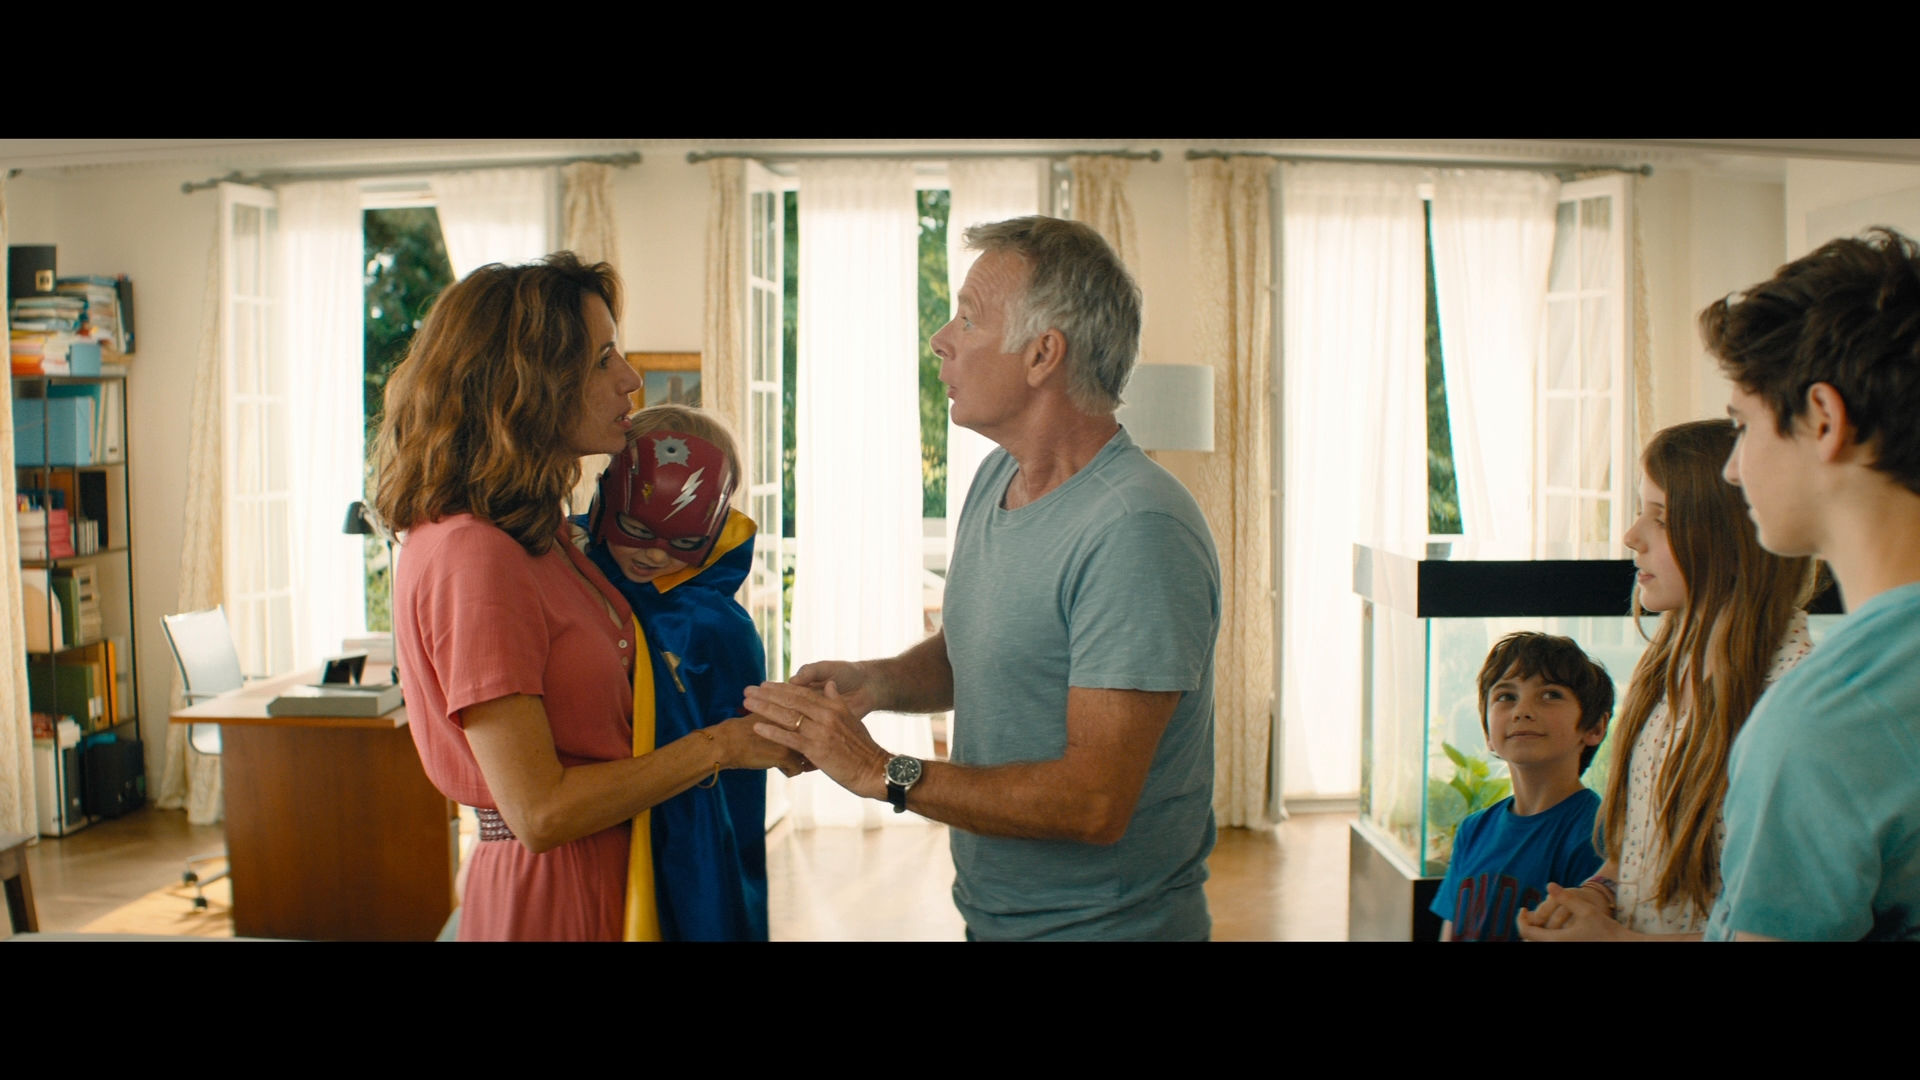 Mamá se va de viaje (2020) 1080p BDRip